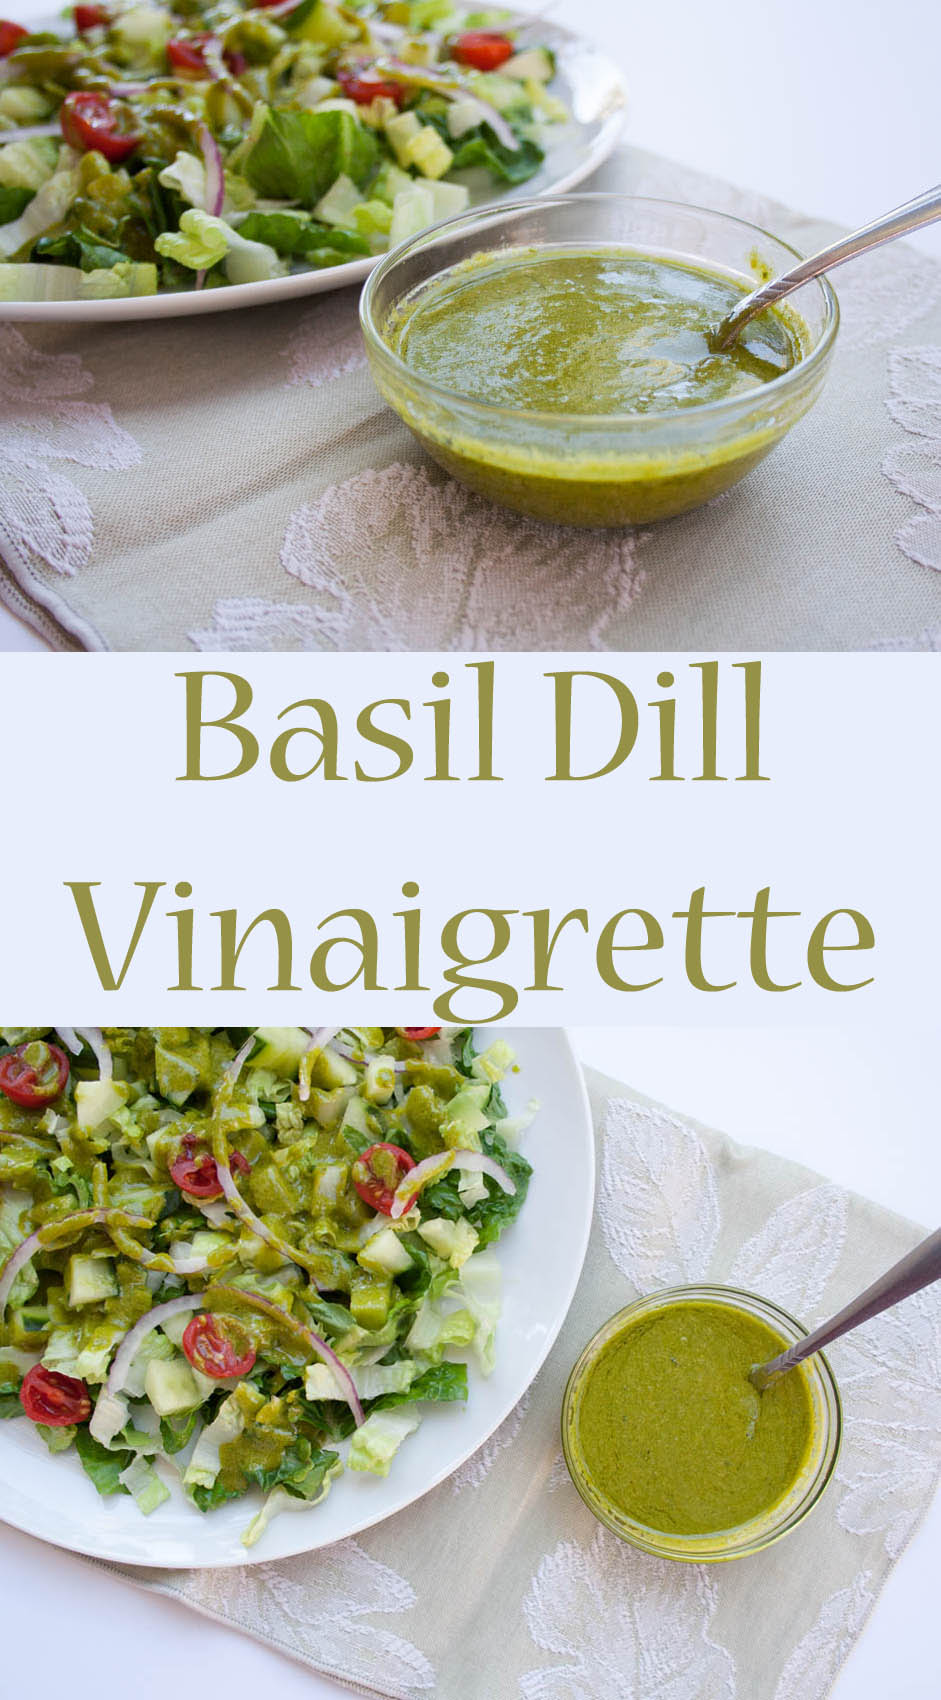 Basil Dill Vinaigrette (vegan, gluten free) This addictive vegan salad dressing has fresh garden herbs, Dijon mustard, agave syrup, cheesy nutritional yeast, red wine vinegar, and extra virgin olive oil.